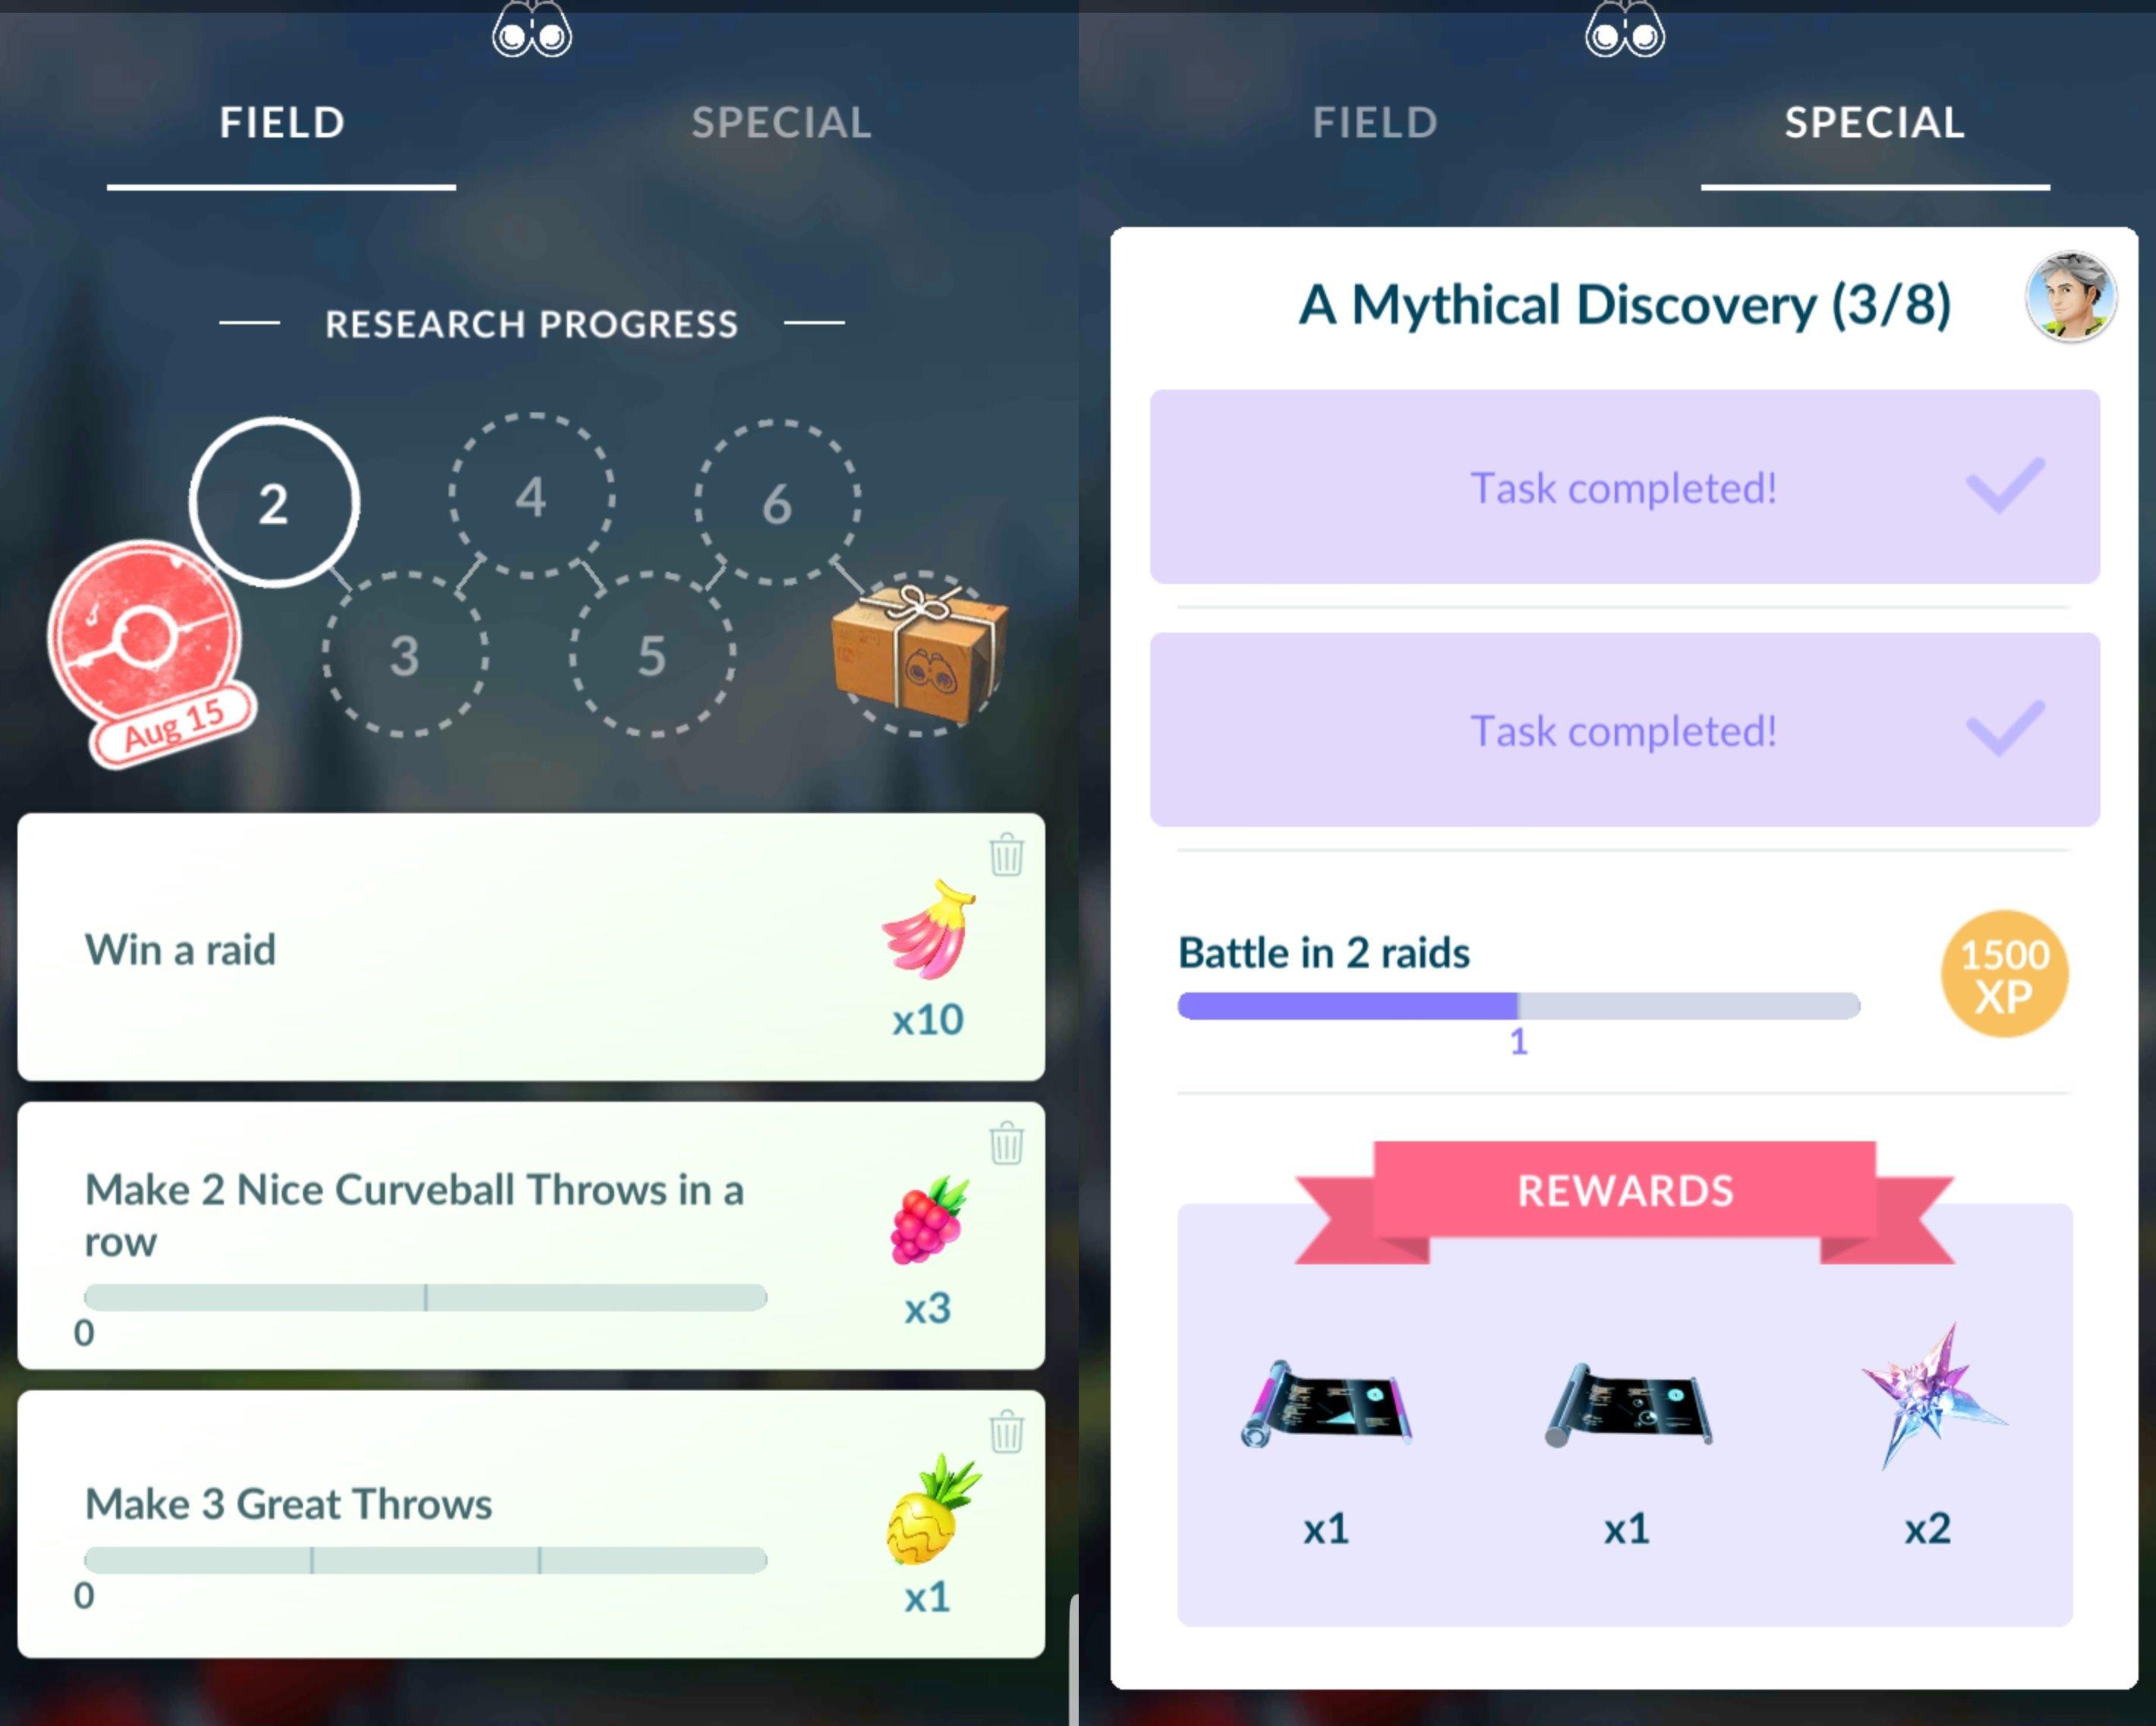 How to get Celebi in Pokémon GO | AllGamers